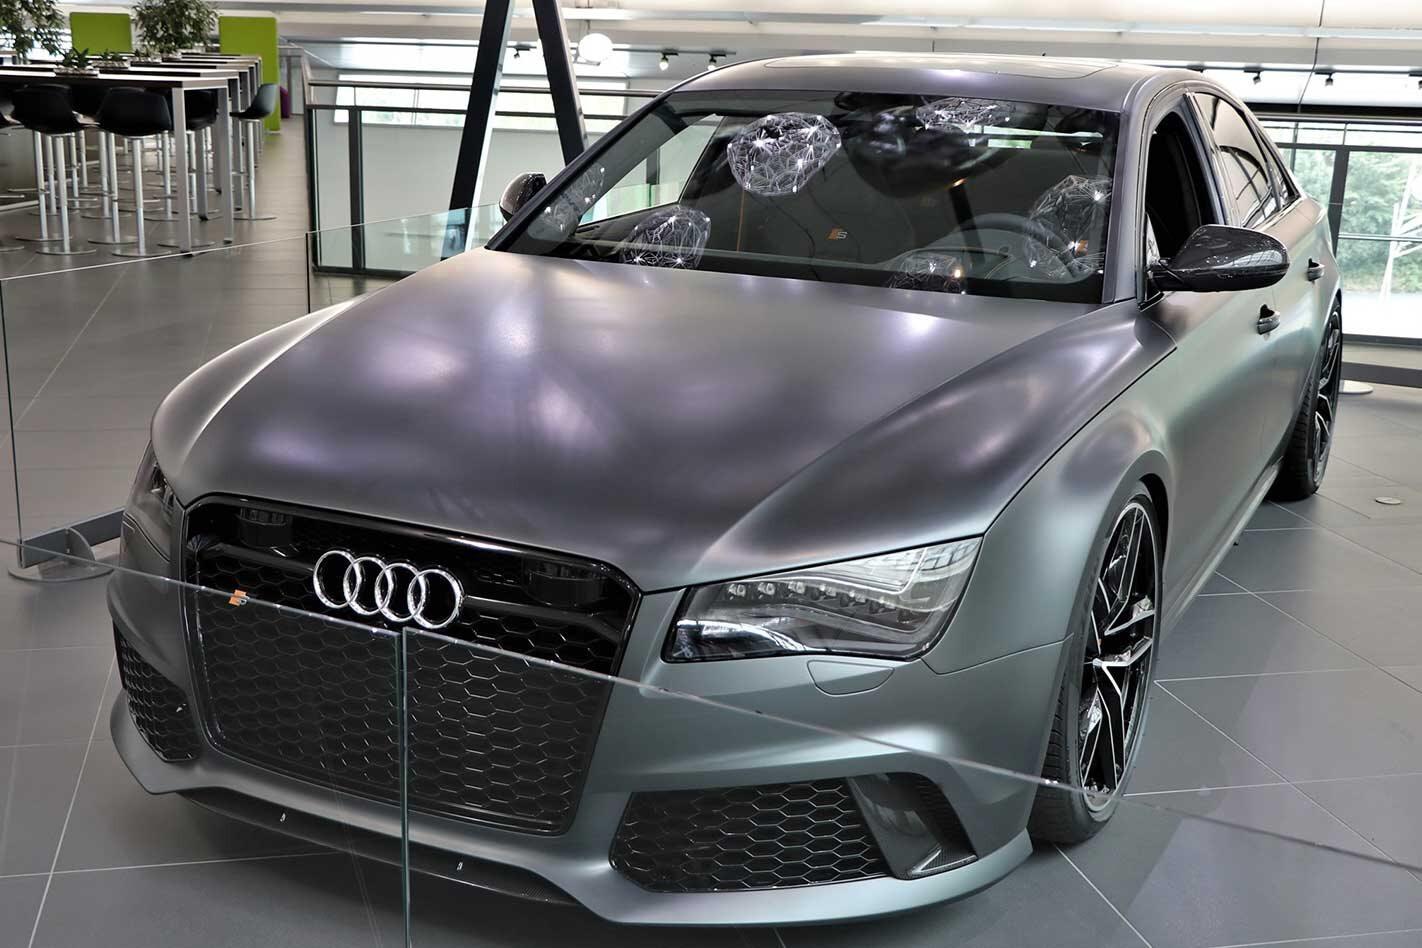 2013 Audi RS8 prototype revealed